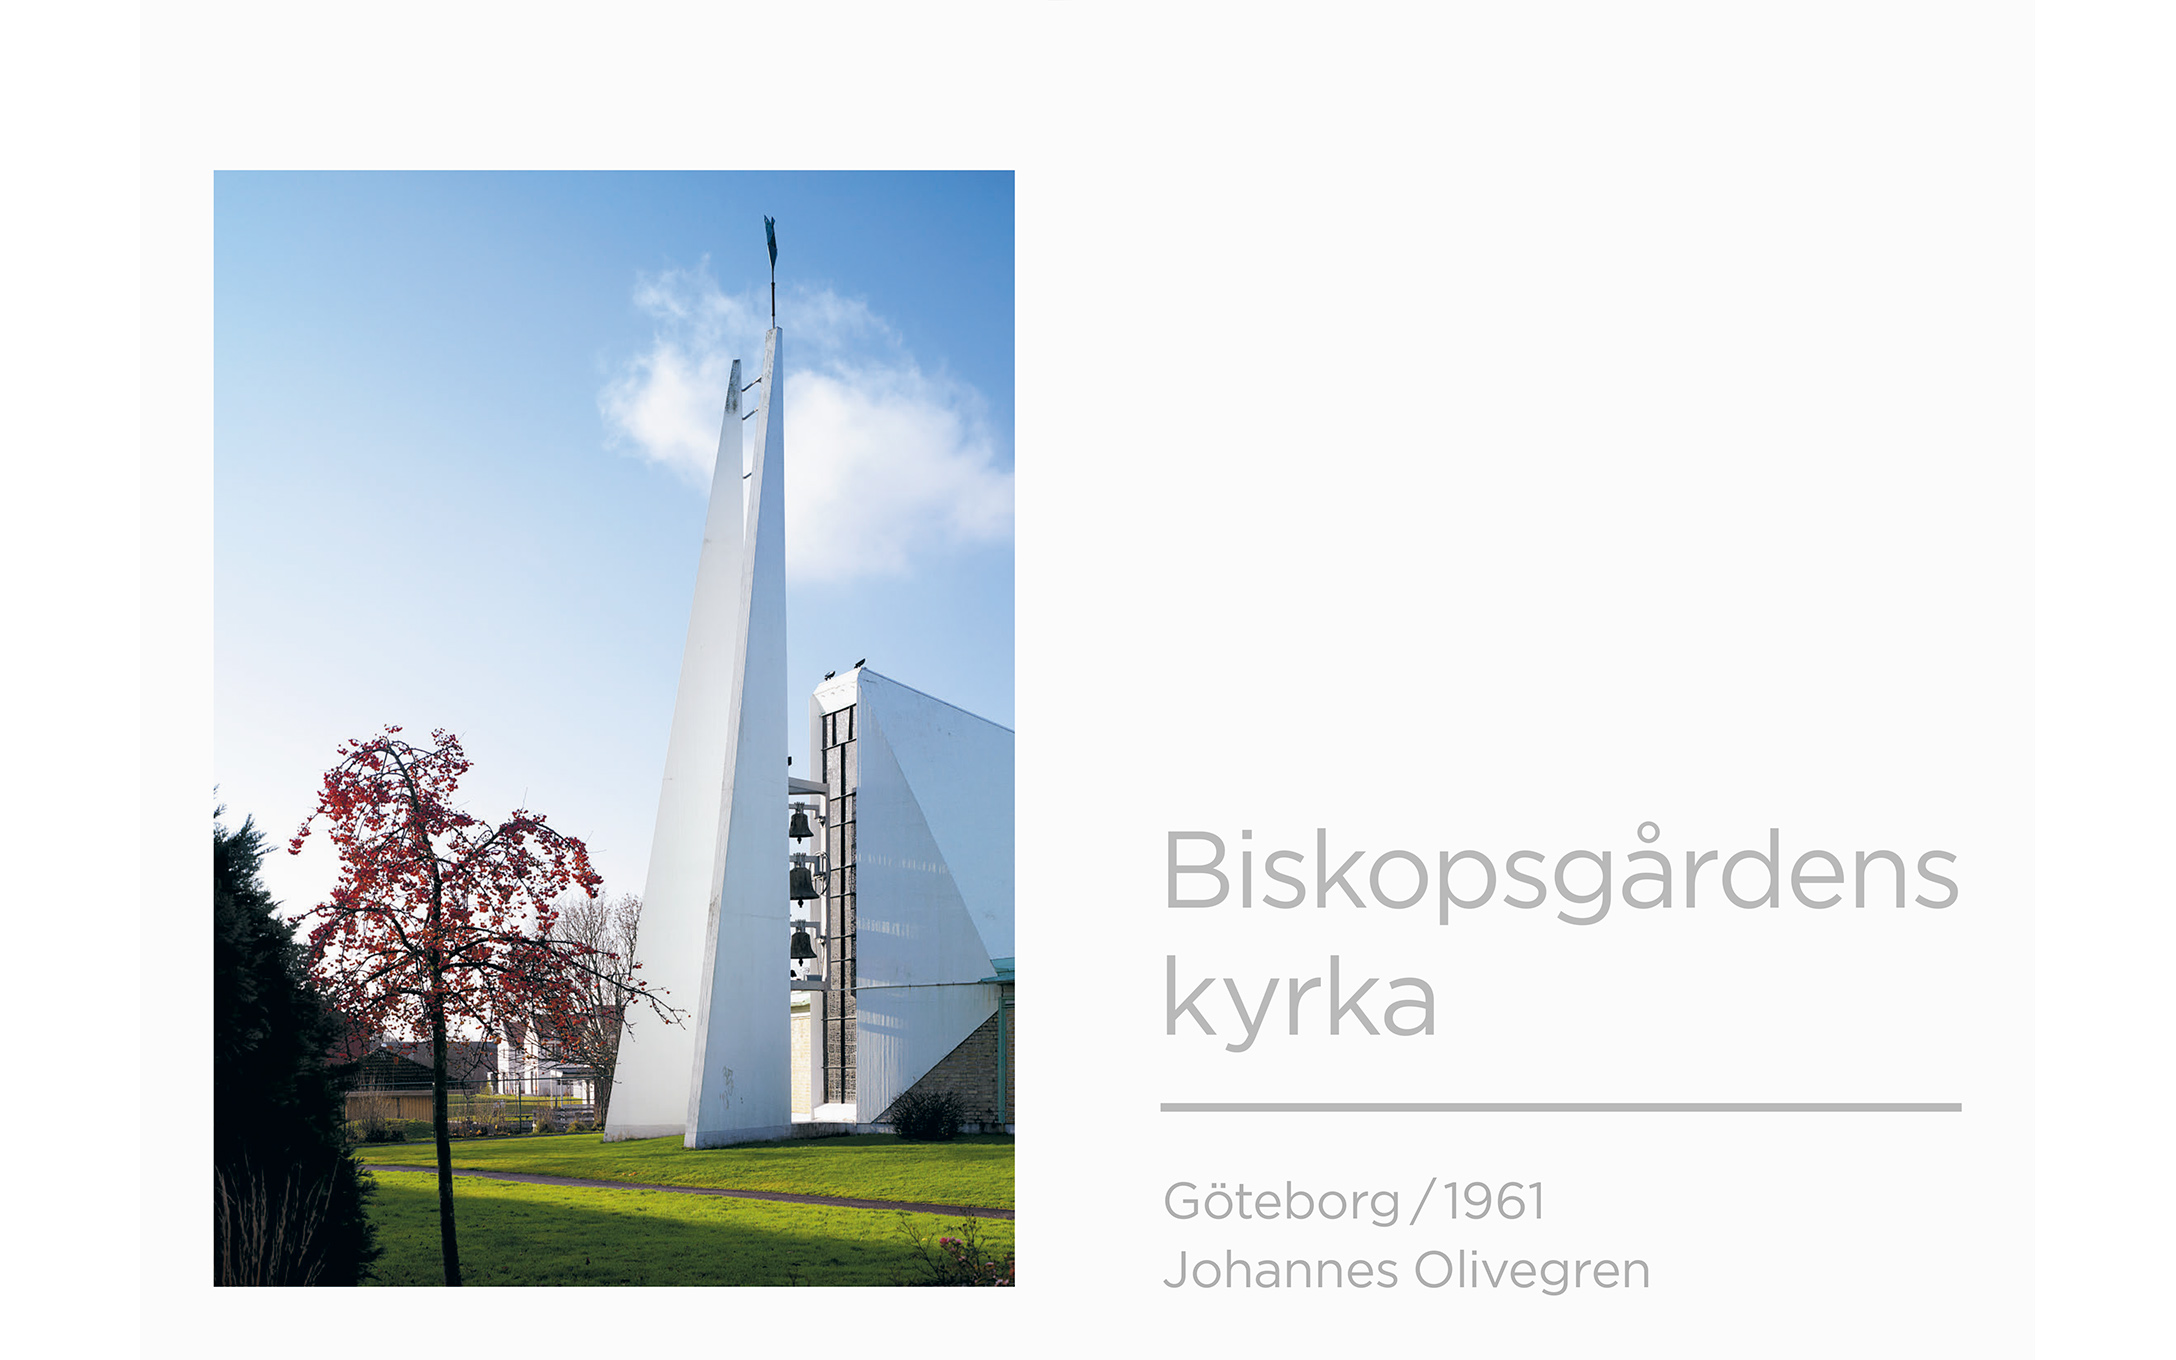 Biskopsgårdens kyrka Göteborg